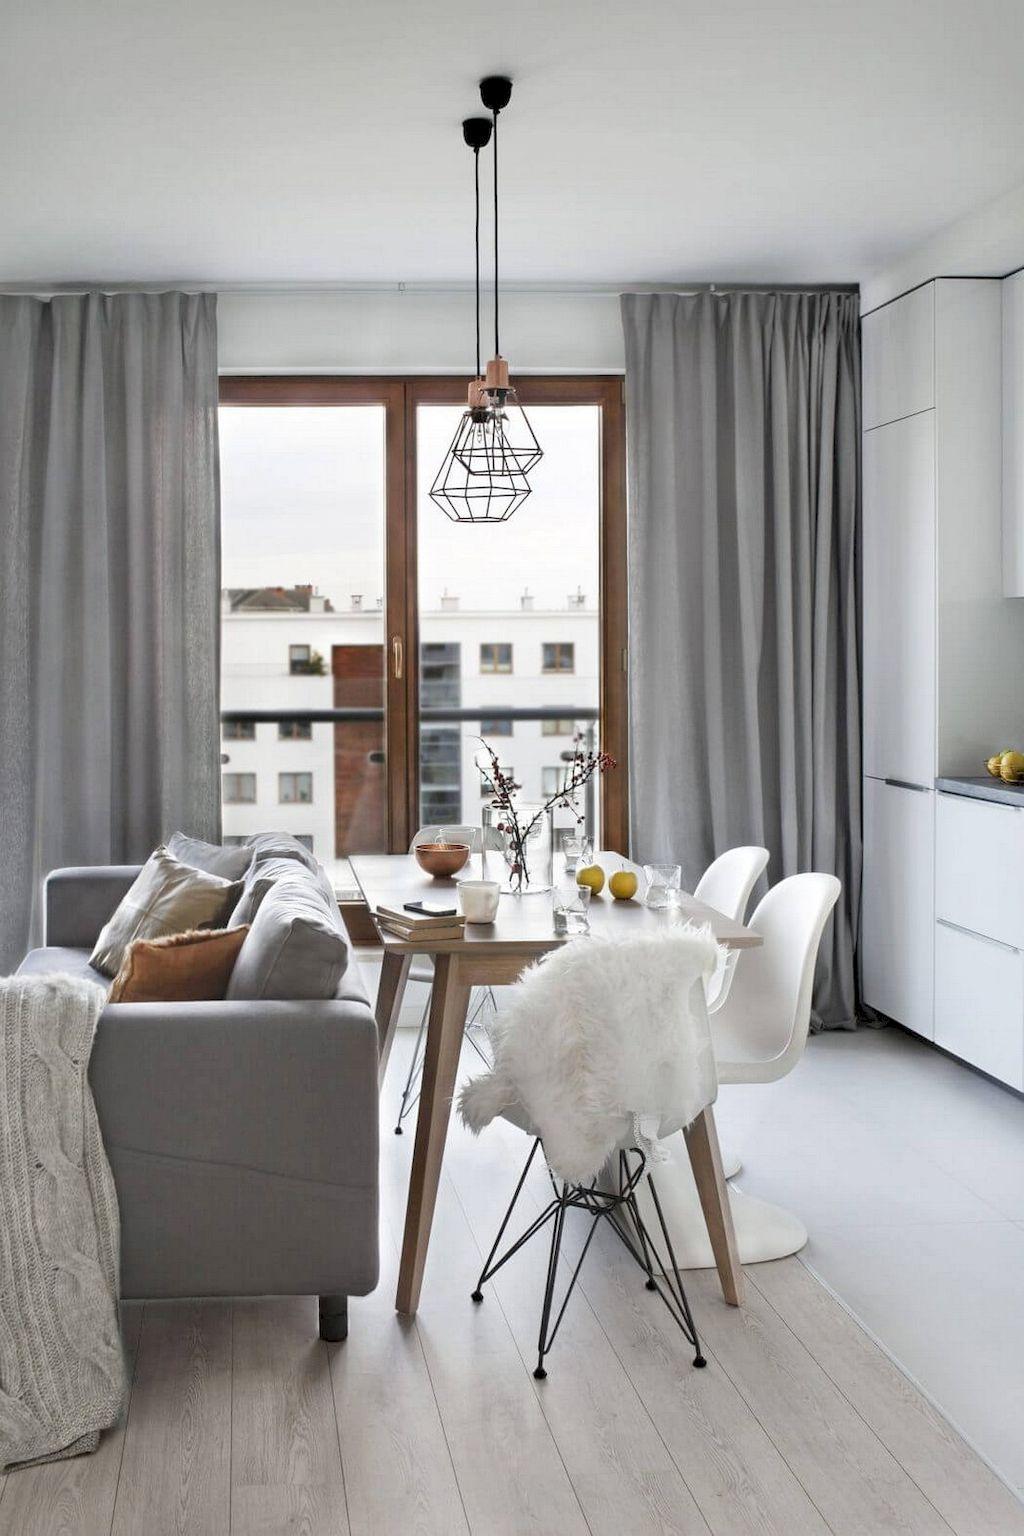 75 Stunning Scandinavian Living Room Decorating Ideas | Scandinavian ...